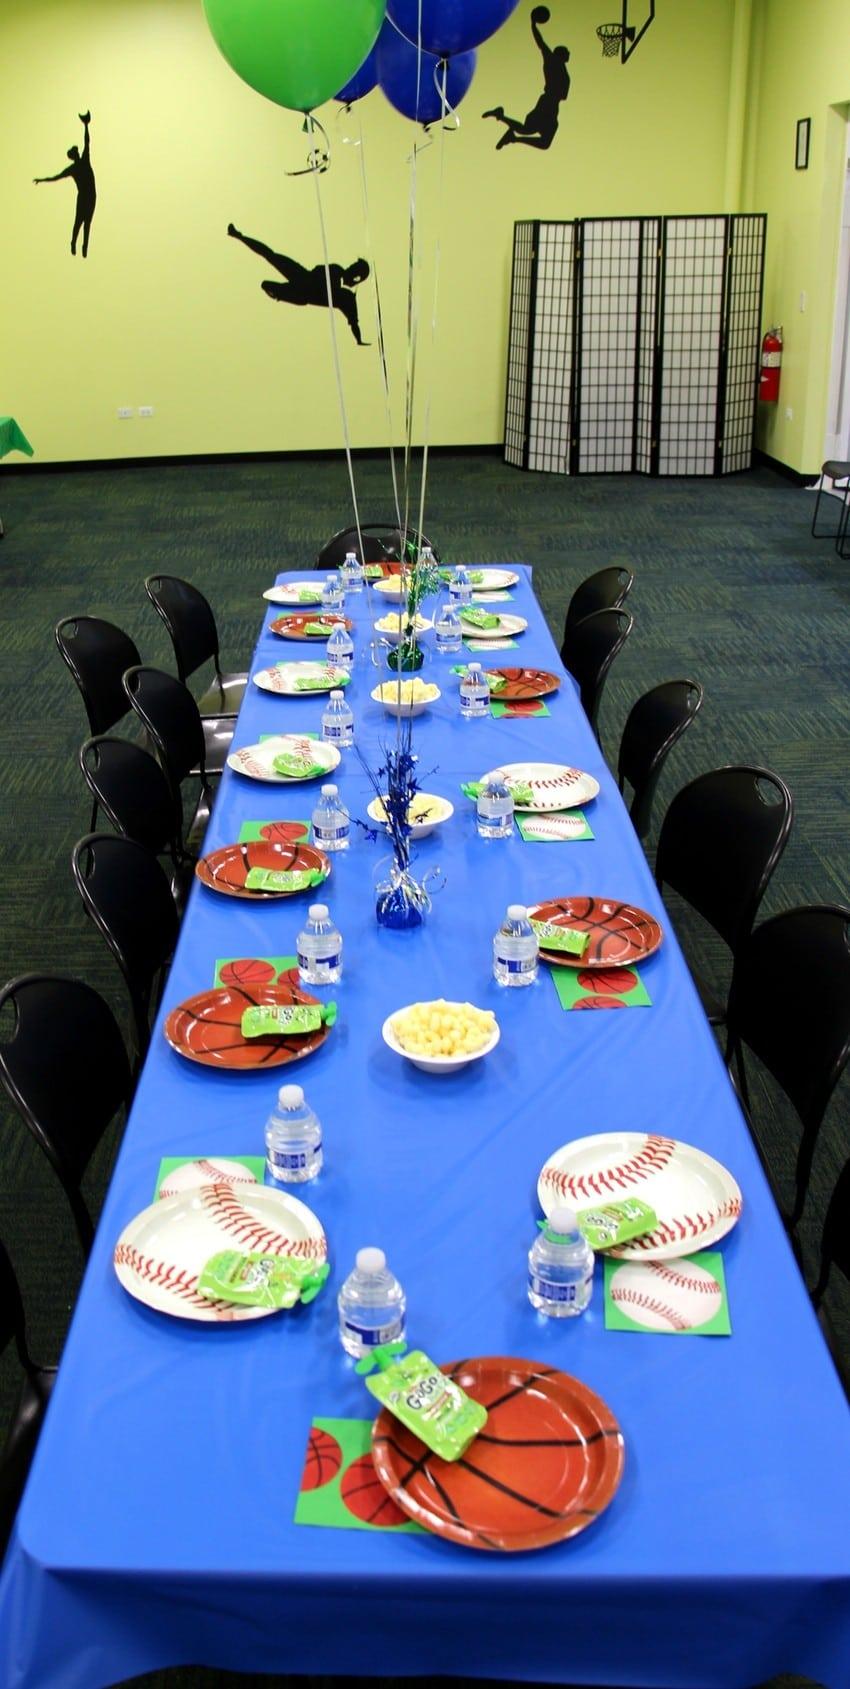 Sports-Rocker Themed Birthday Party - Table